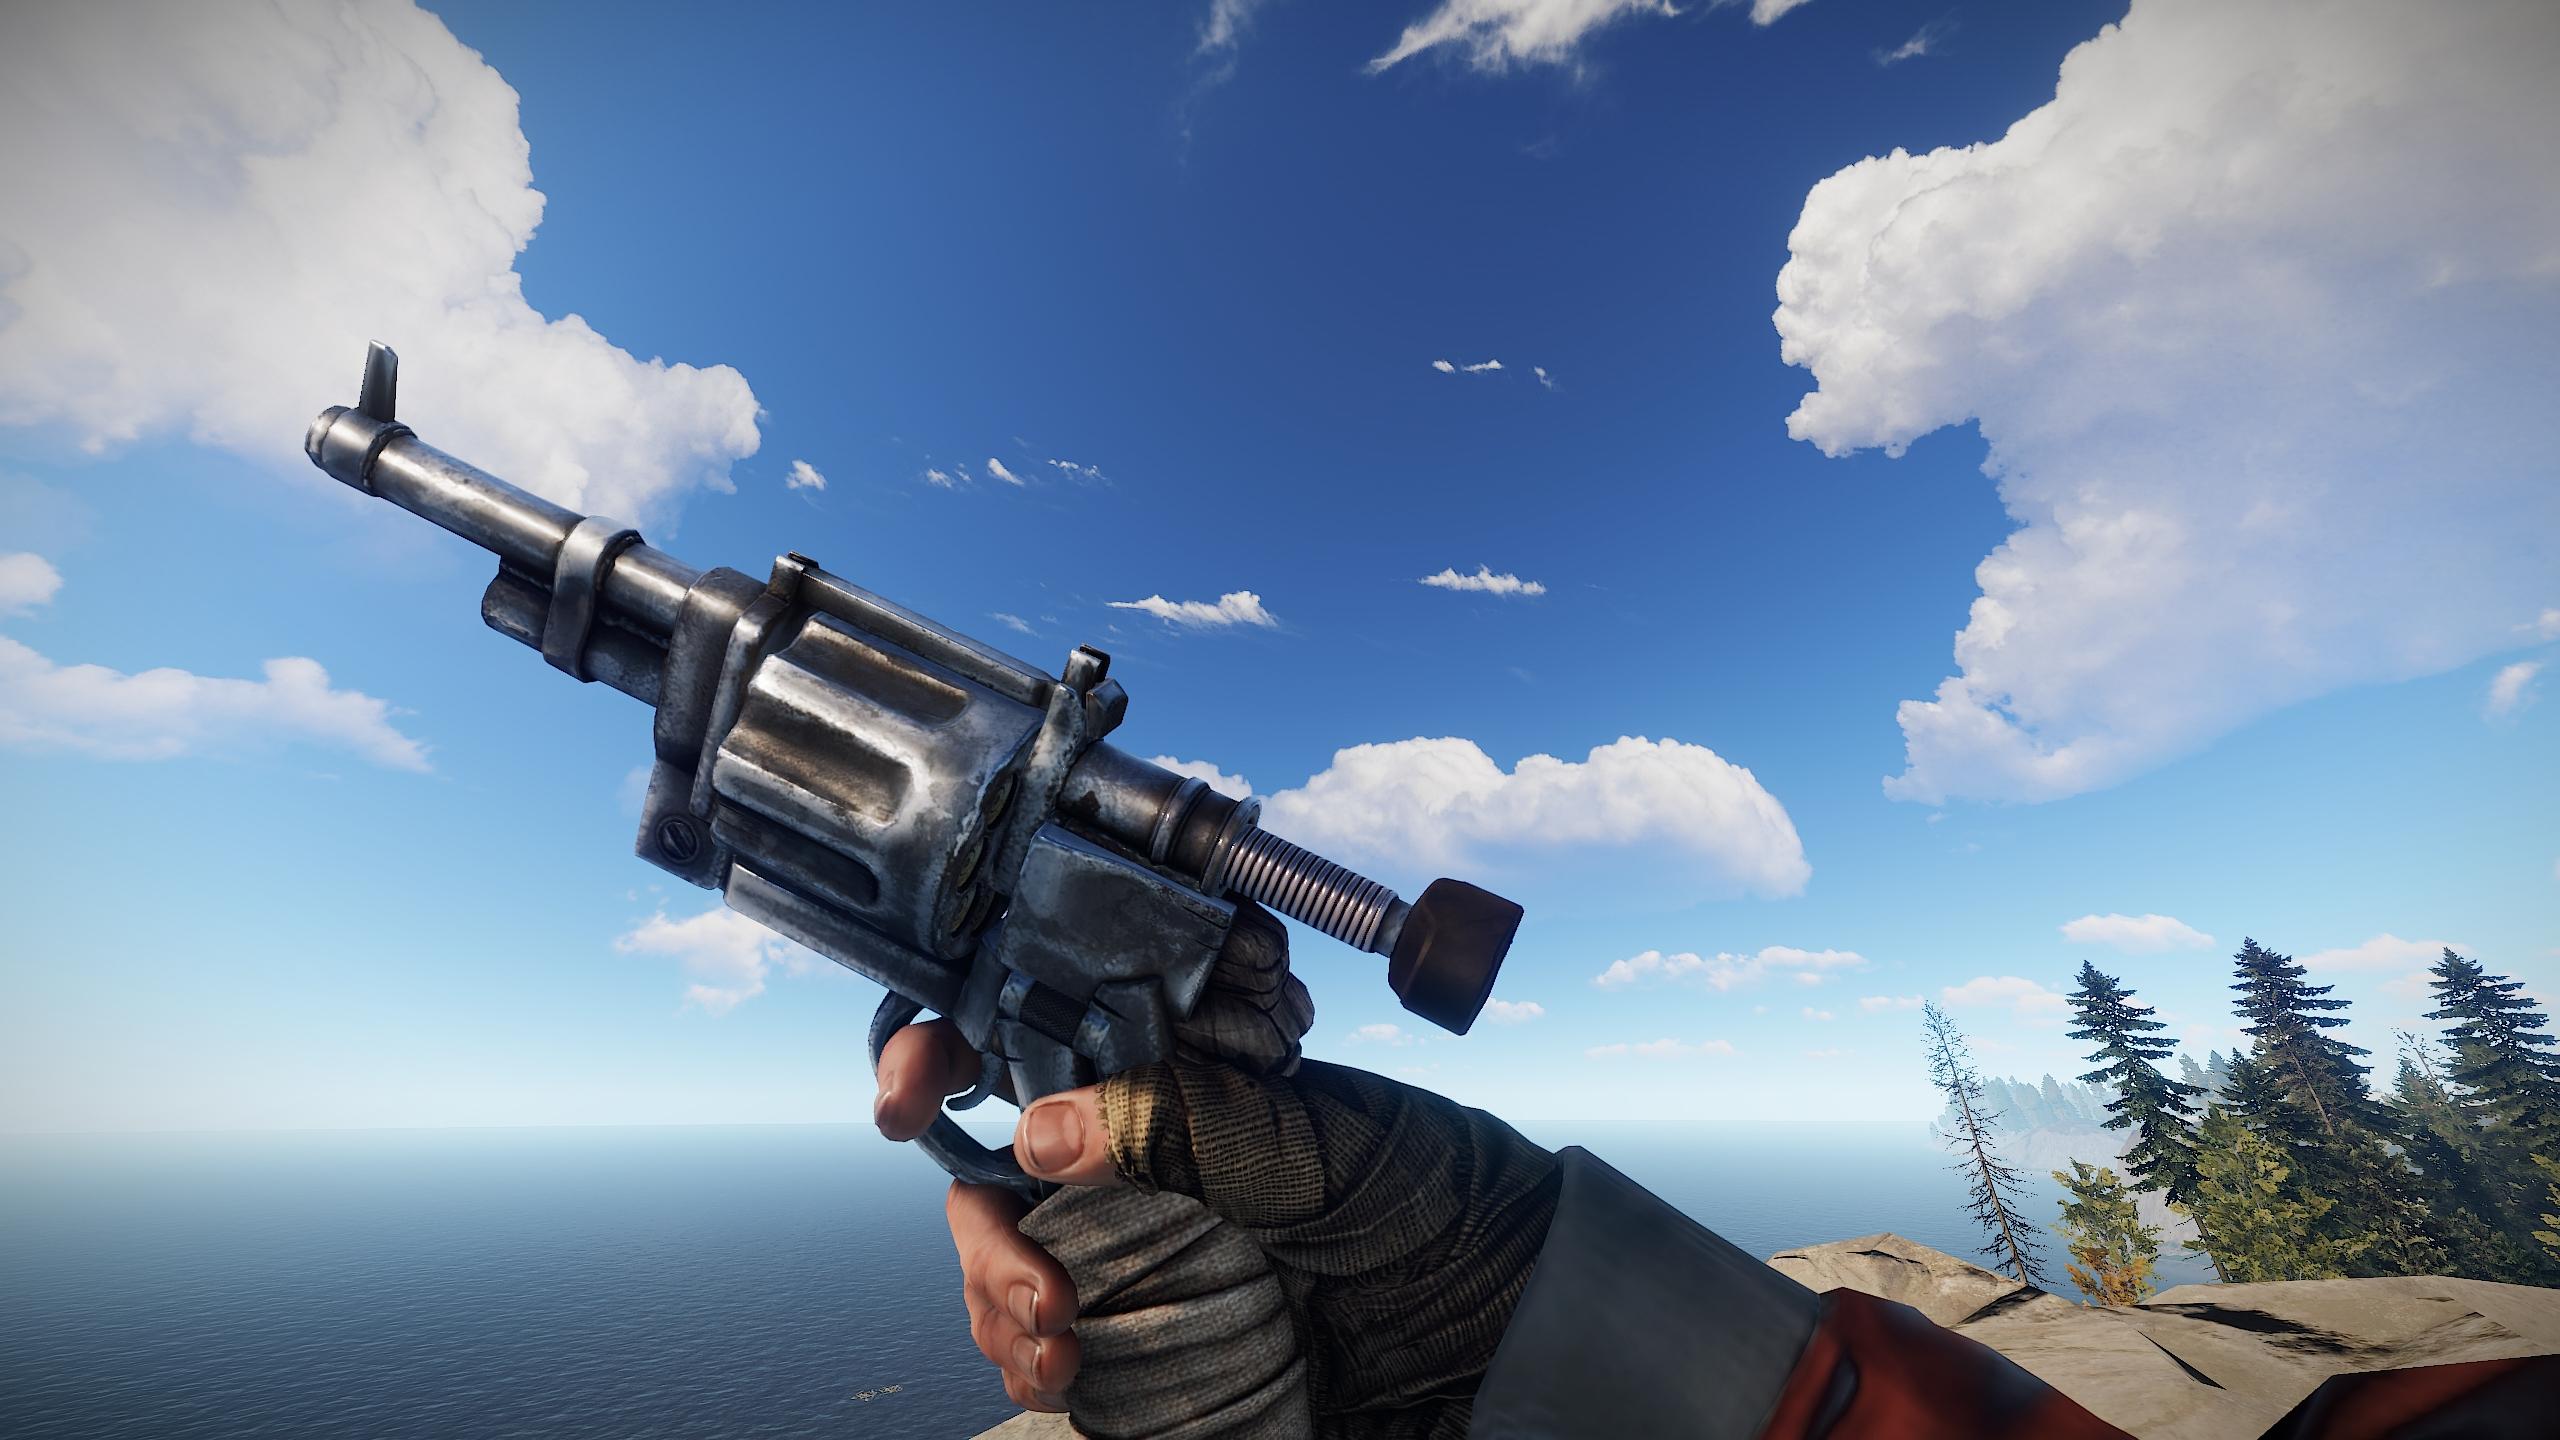 The_Cargo_Ship_Update_14.jpg